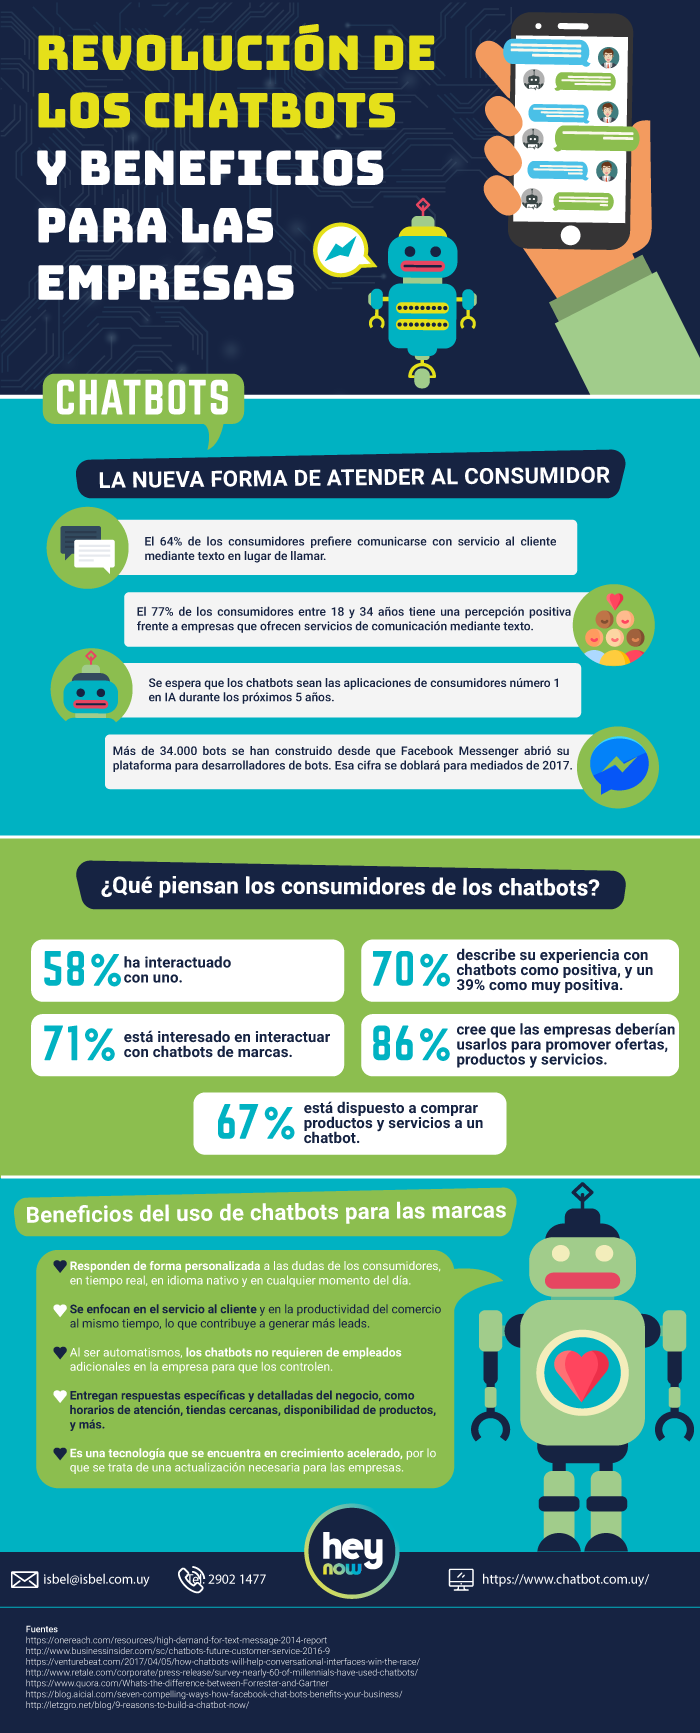 Chatbots + Infografía + Hey